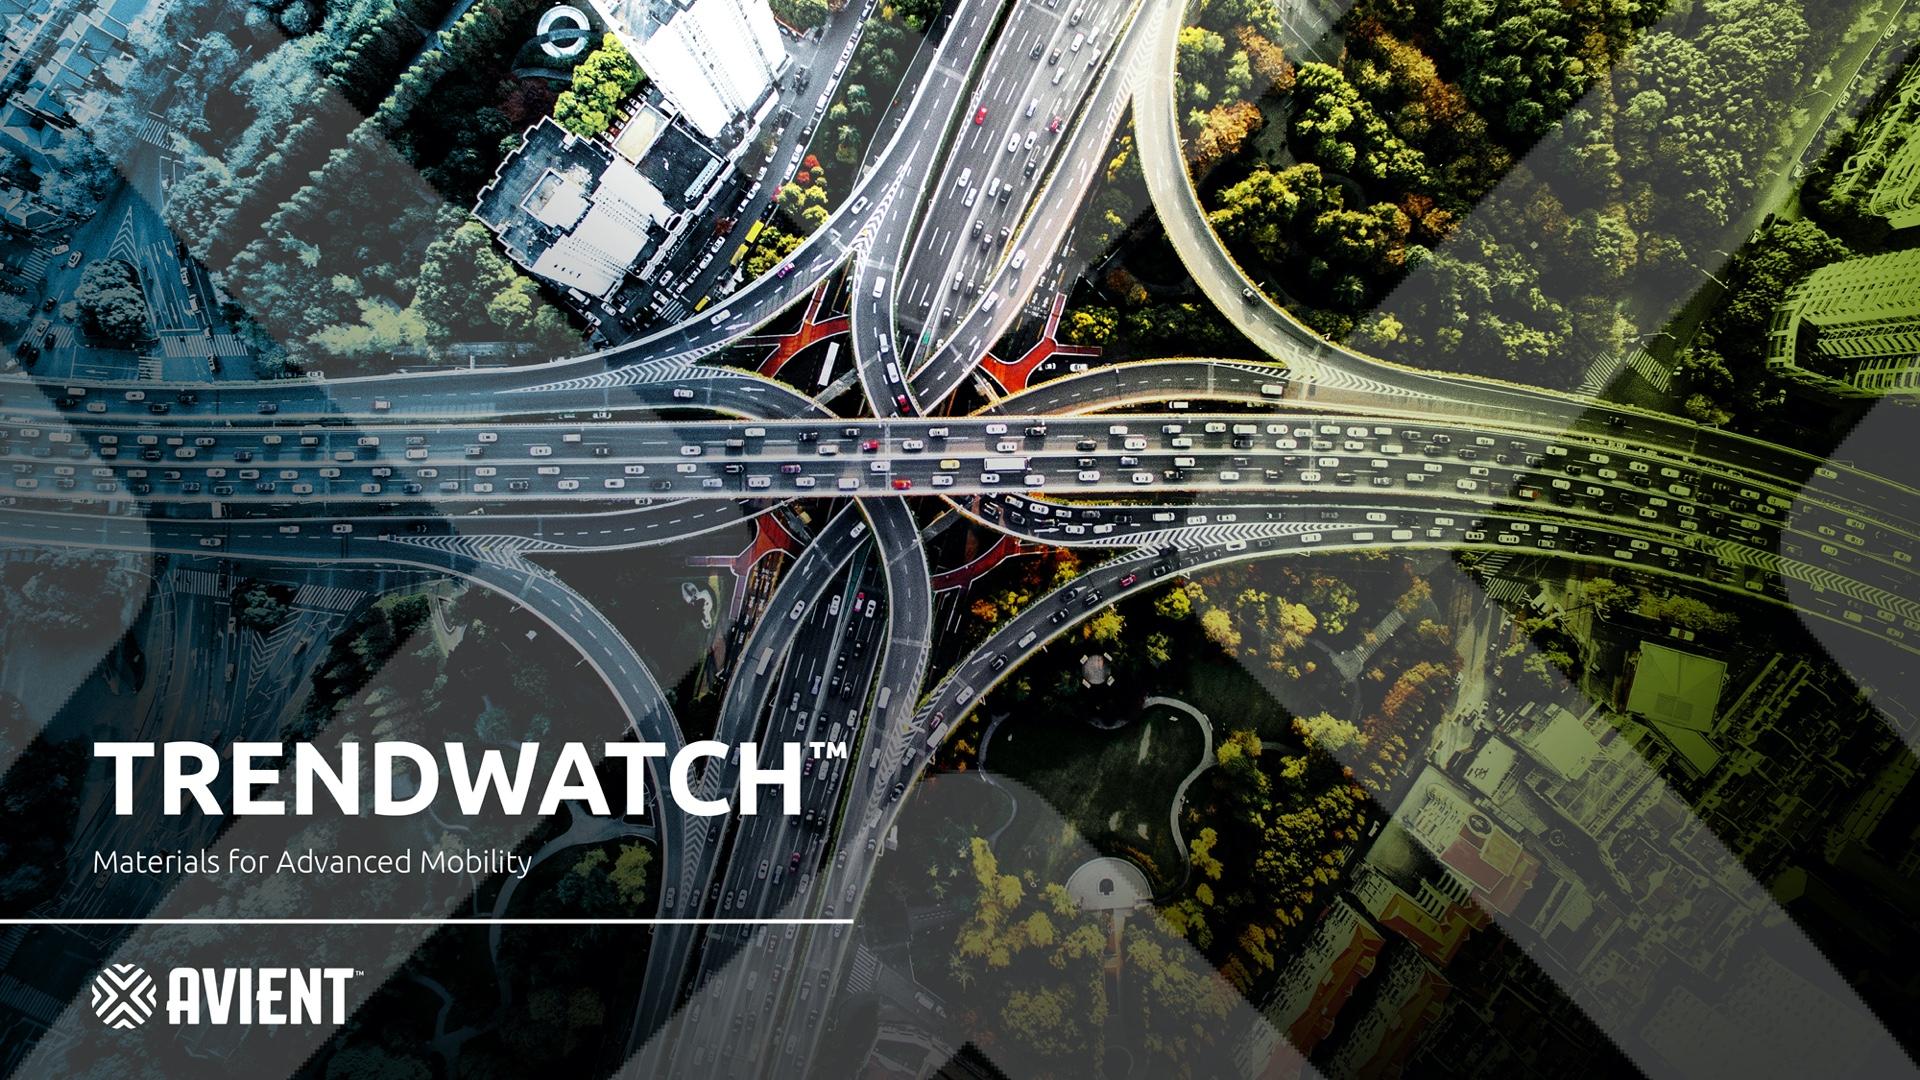 https://www.avient.com/sites/default/files/2020-12/trendwatch-adv-mobility-cover.jpg